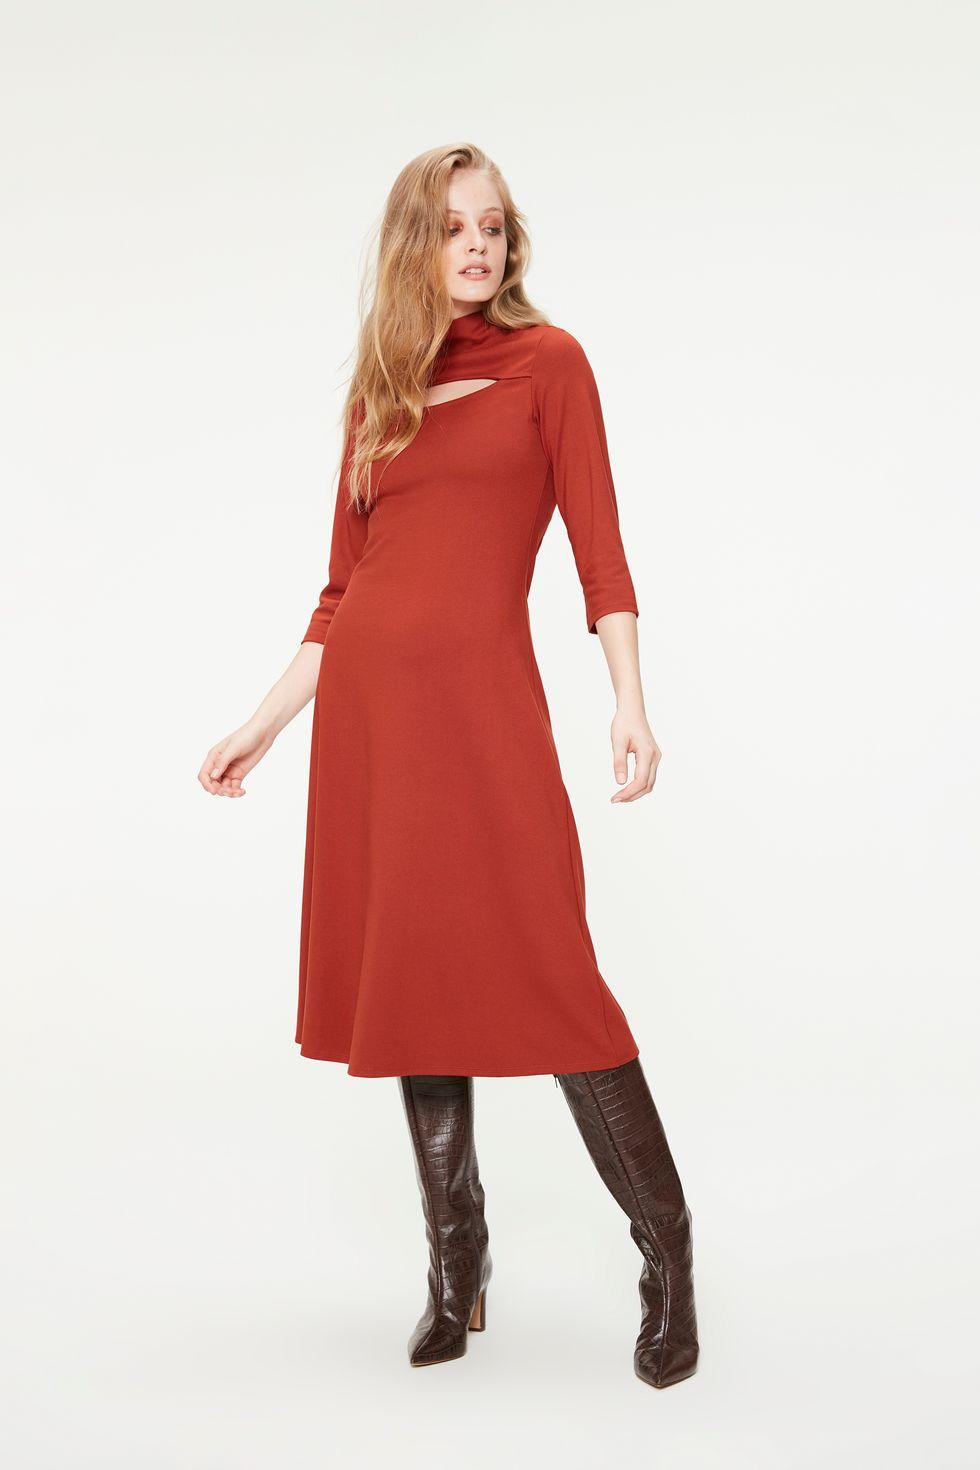 Vestido-Midi-Gola-Alta-com-Mangas-3-4-Frente--